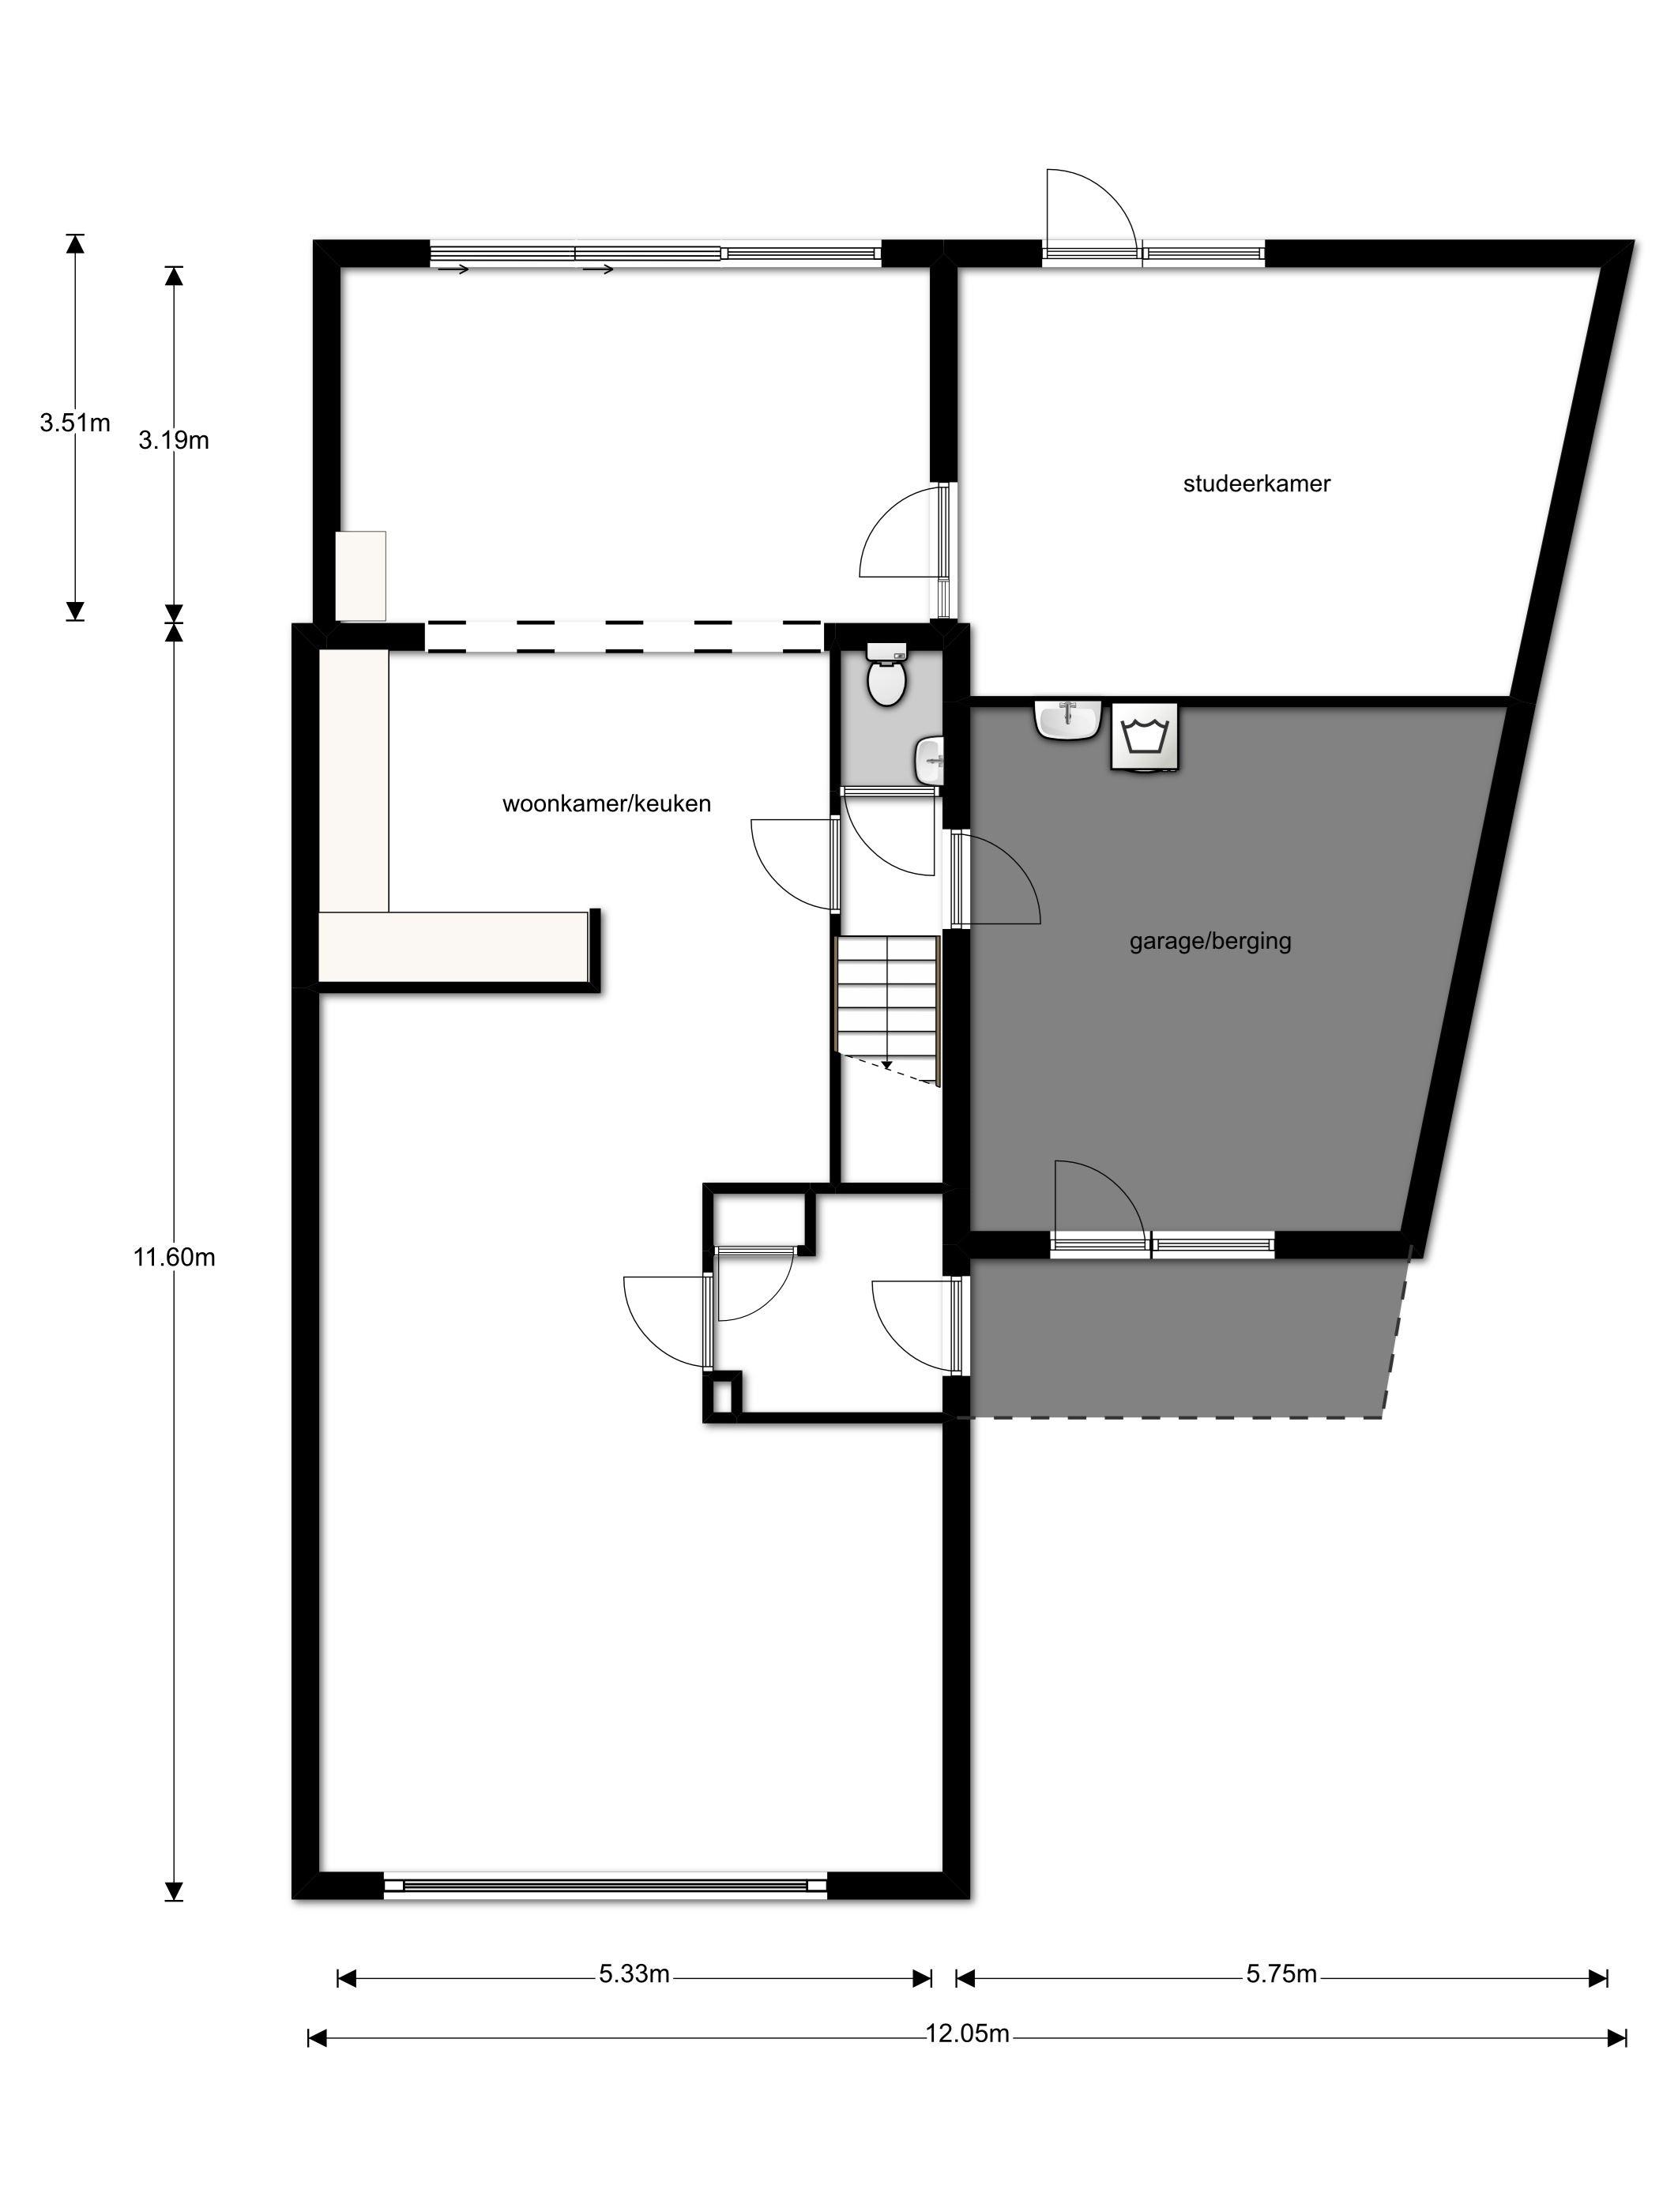 Huis te koop: Overlangelstraat 1 5045 SR Tilburg [funda]